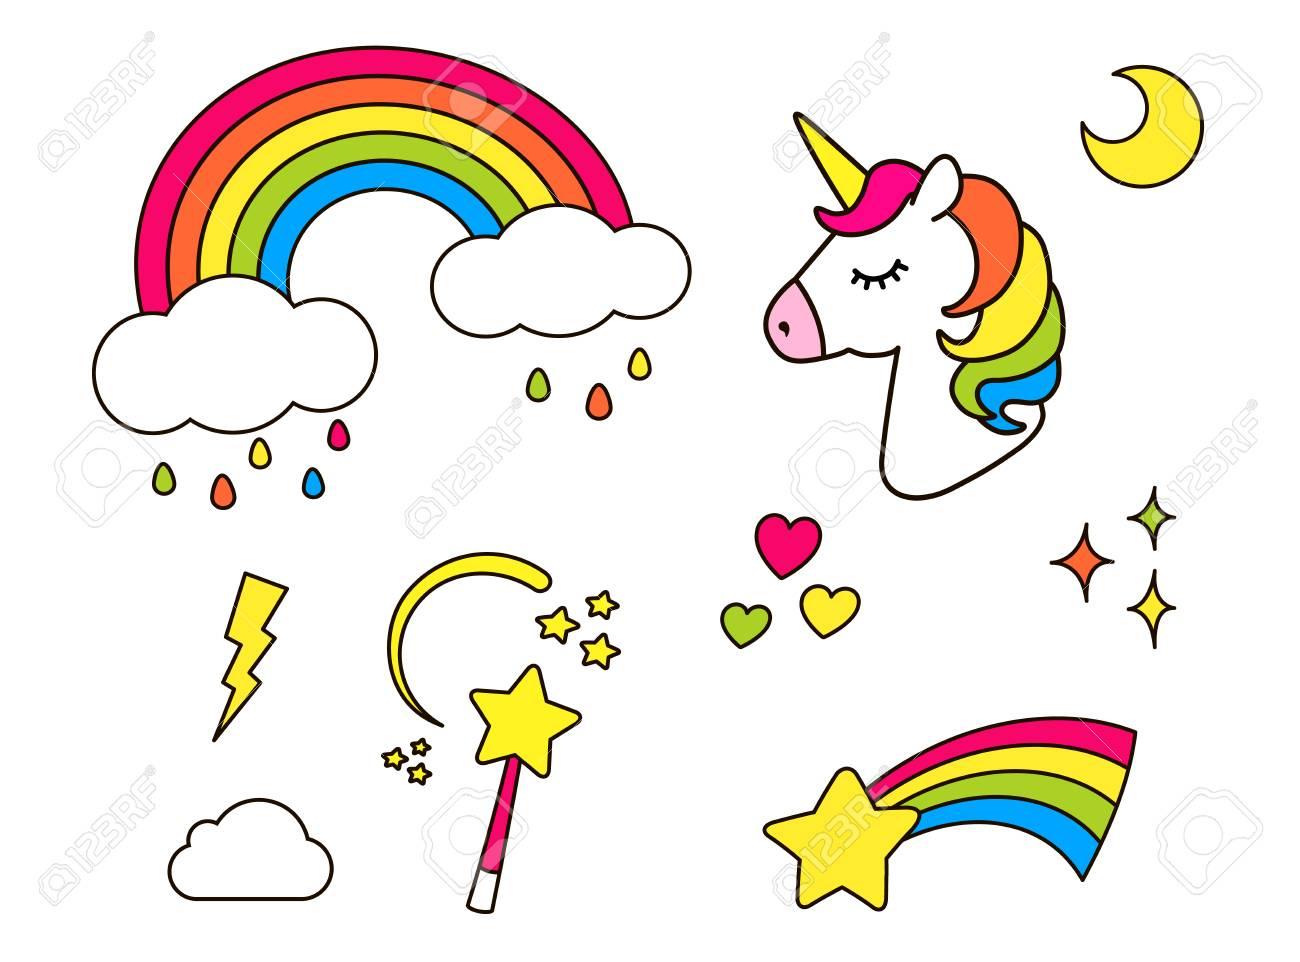 Stickers Set With Unicorn Rainbow Star Cloud Magic Wand